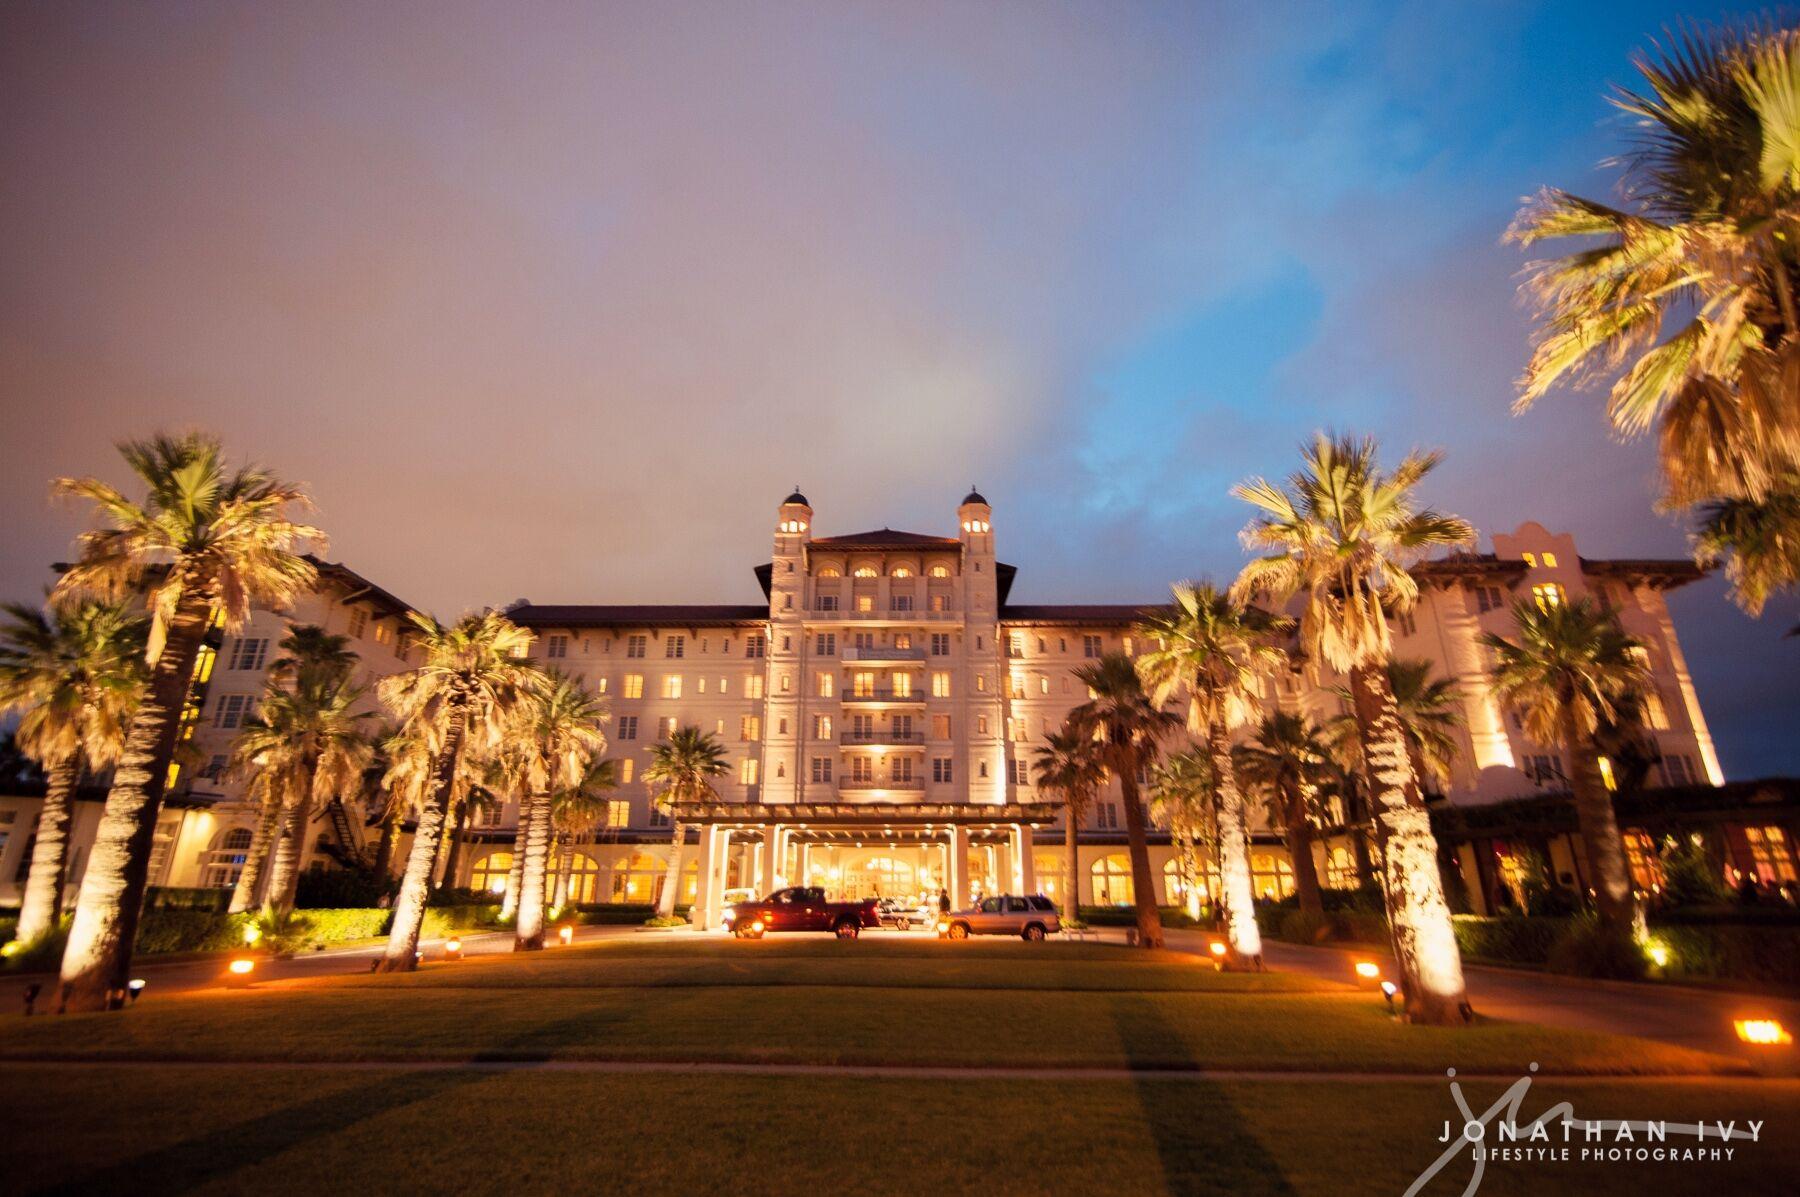 Hotel Galvez Amp Spa Galveston Tx